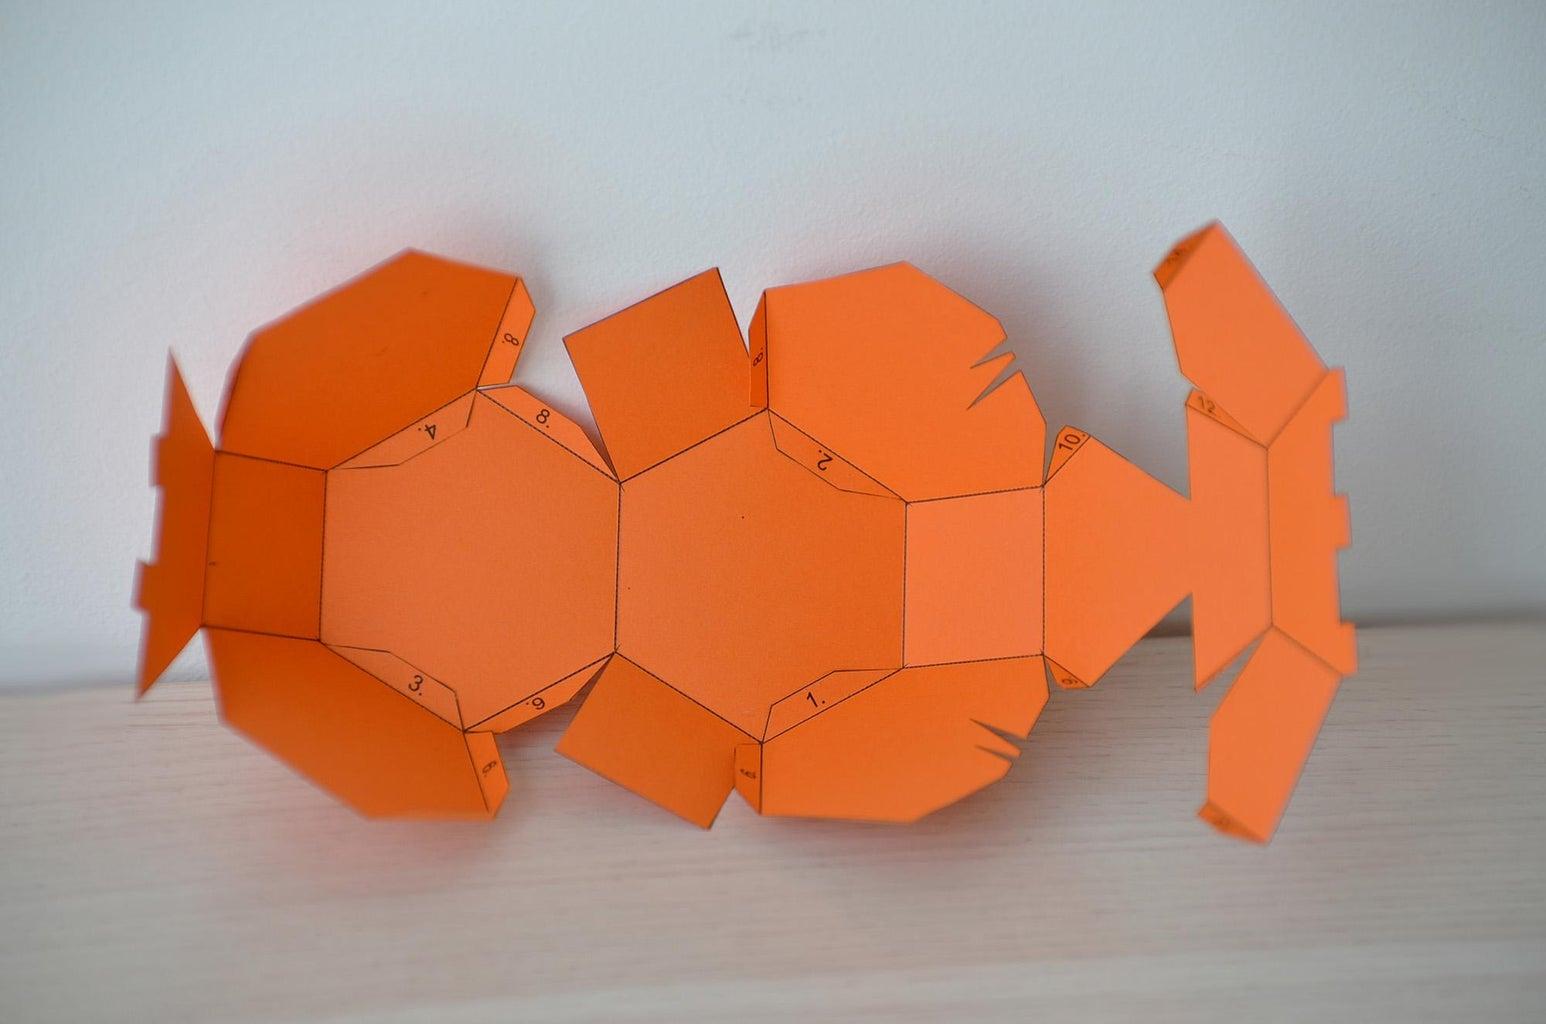 Assembling the Truncated Octahedron